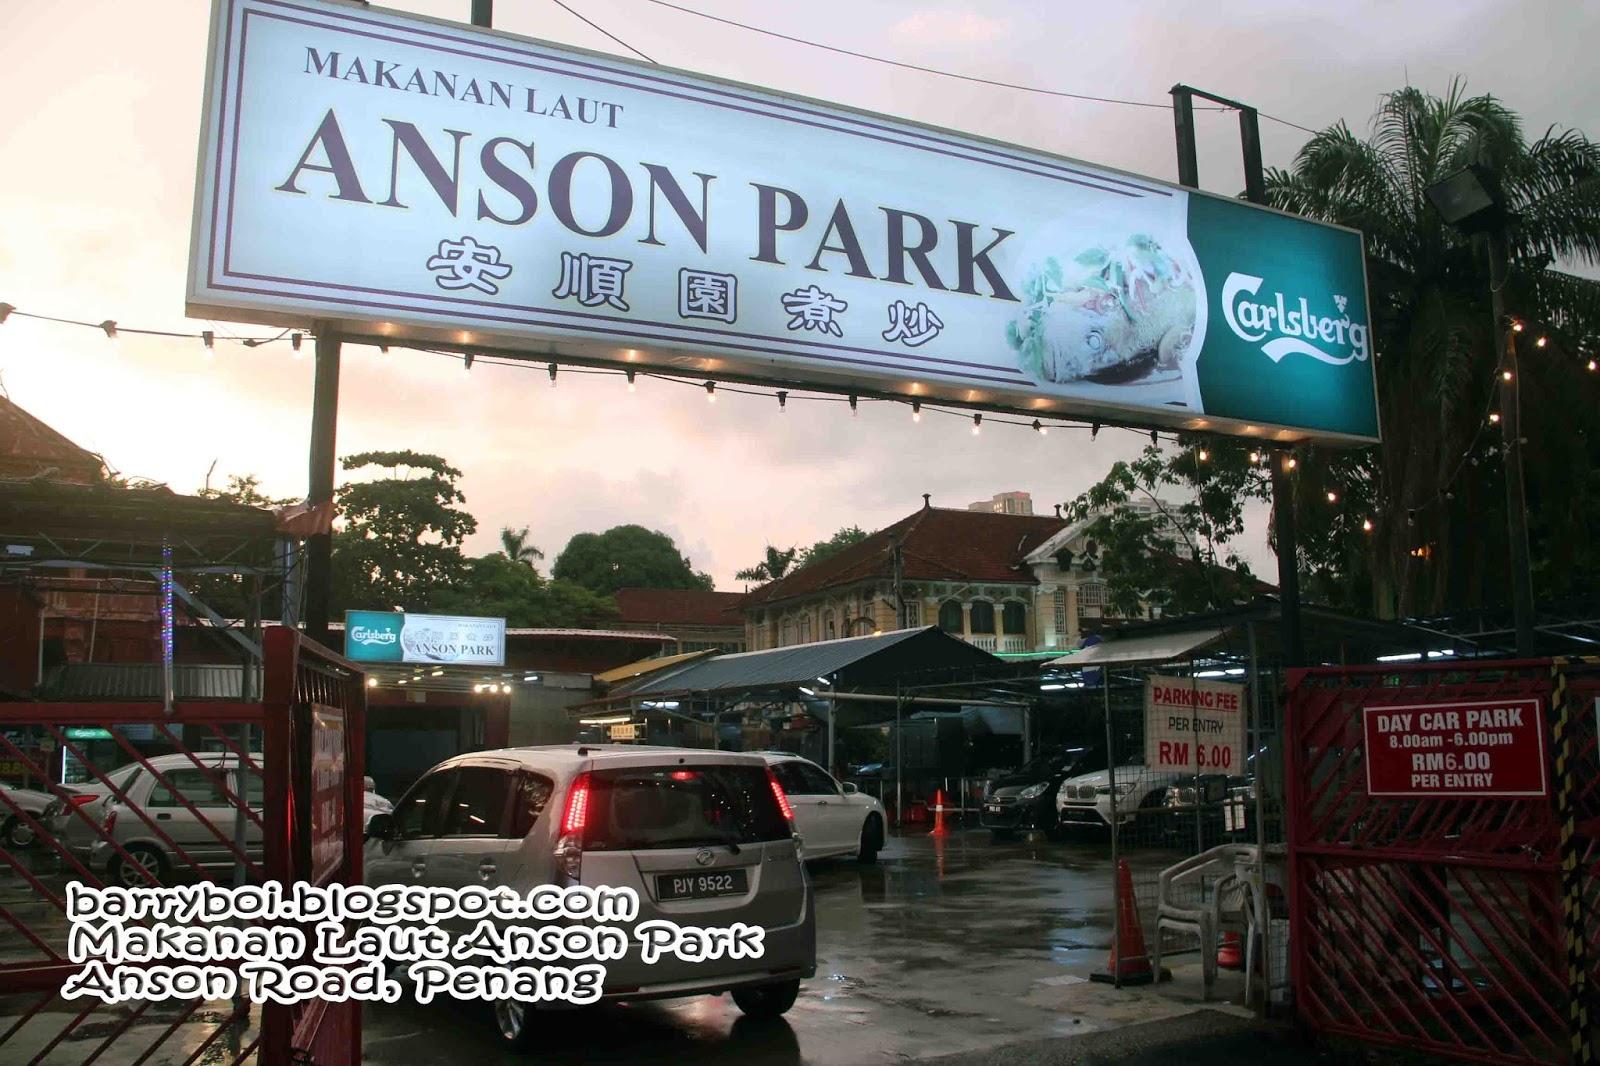 Daily Moments By Barryboi Anson Park Food Corner At Anson Road Penang